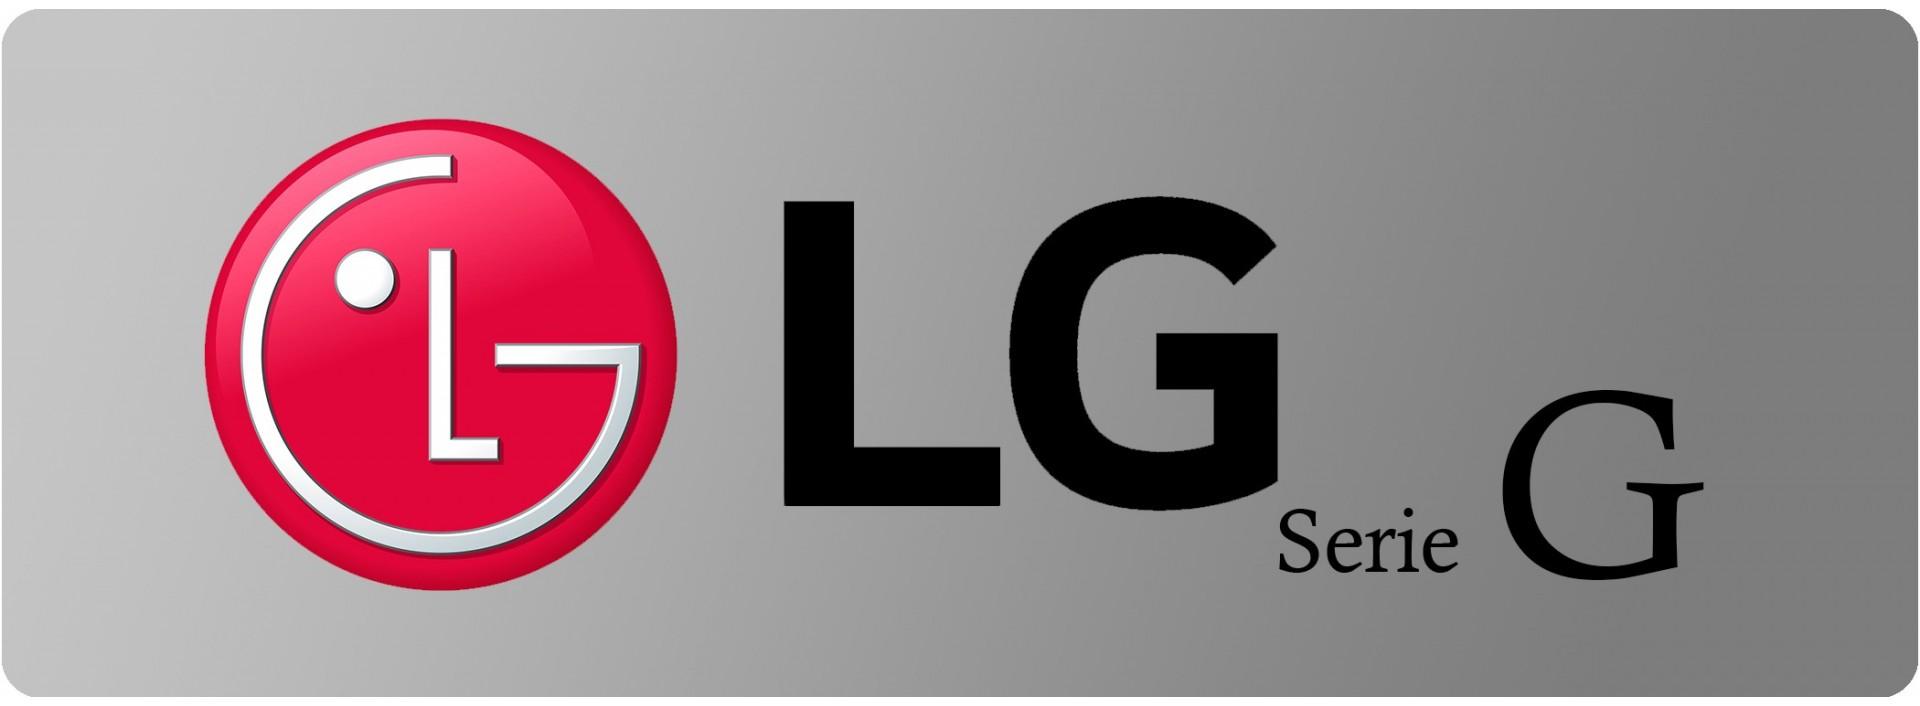 Fundas para LG Serie G